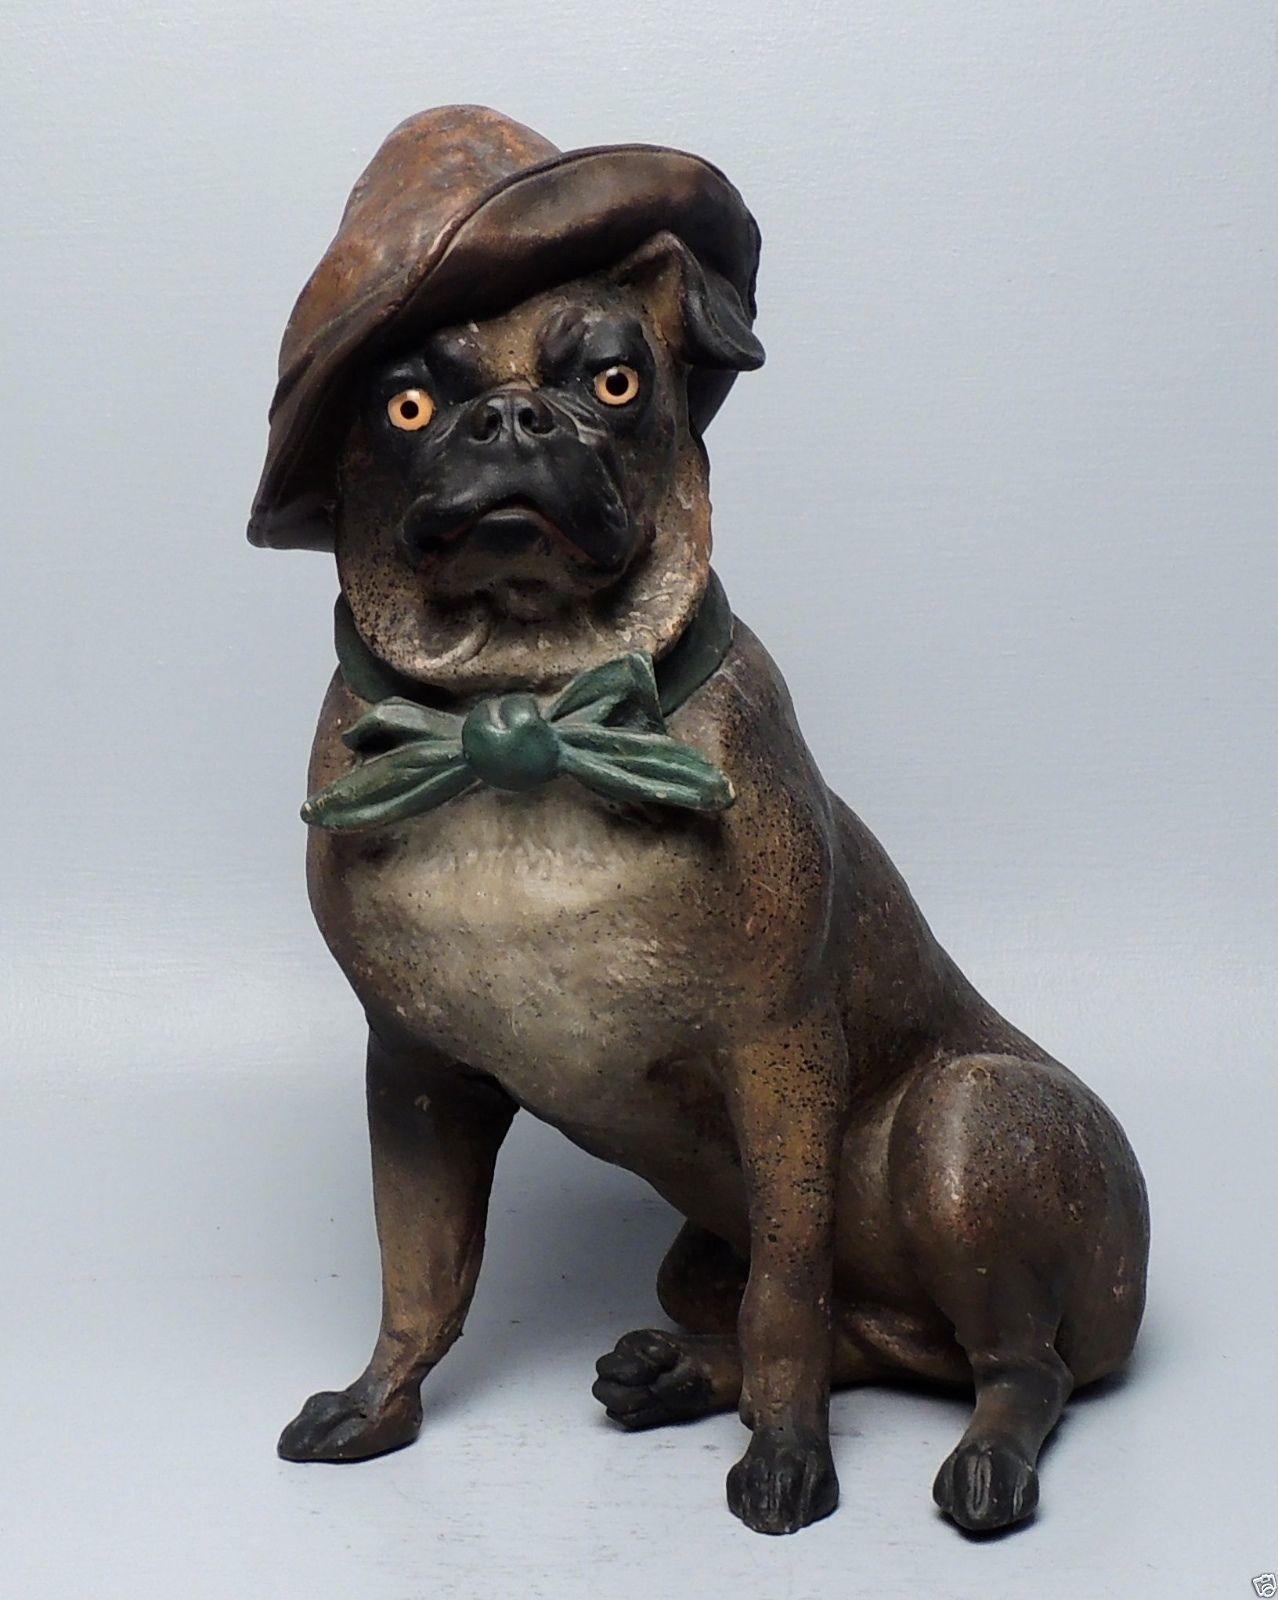 Antique Austrian Or German Terracotta Pottery Pug Dog